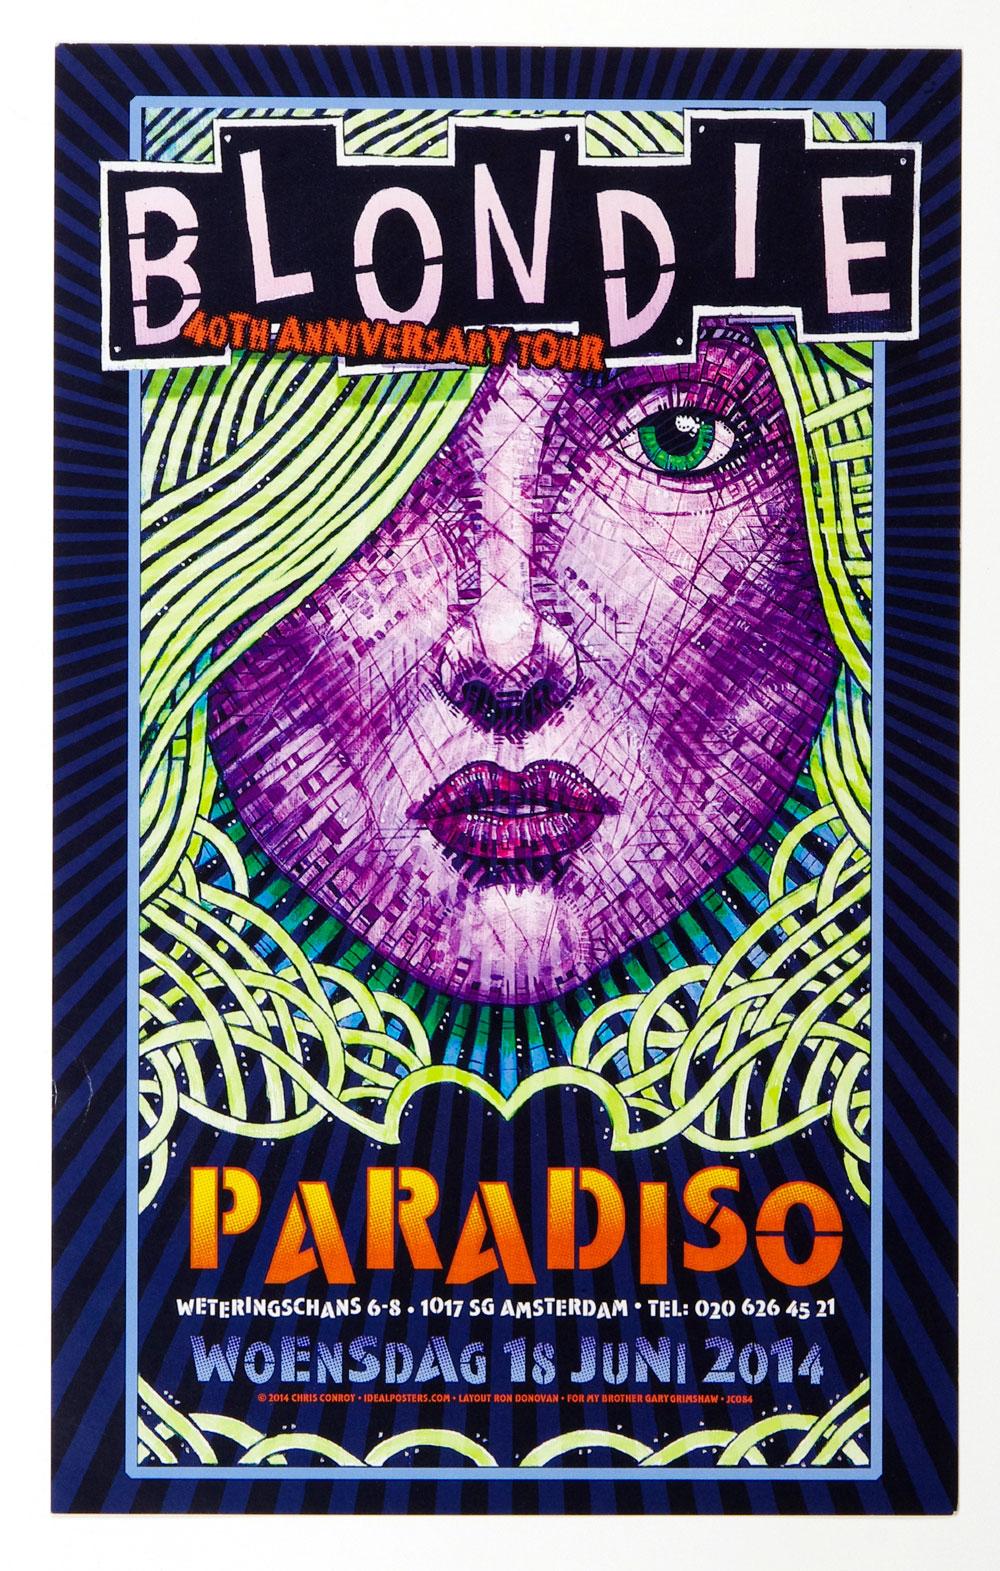 Blondie Poster 2014 Jun 18 Paradiso Amsterdam Netherlands